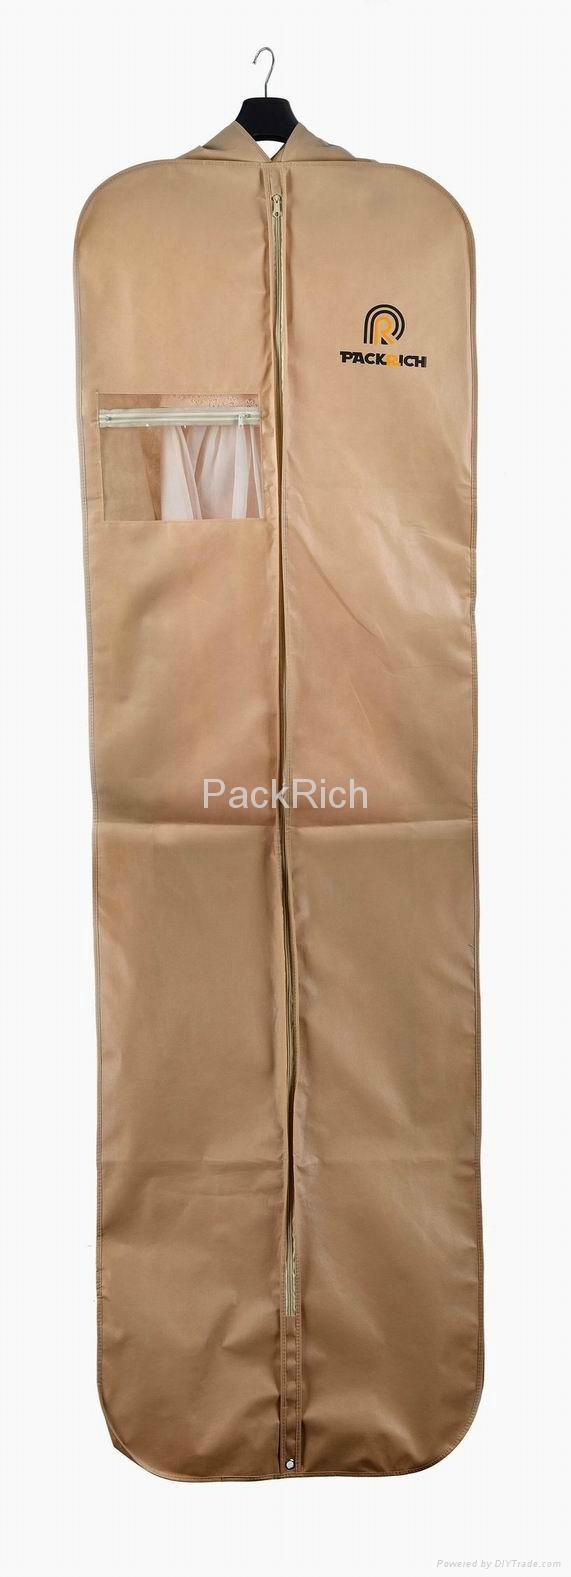 Customed non-woven bridal wedding gown bag 1